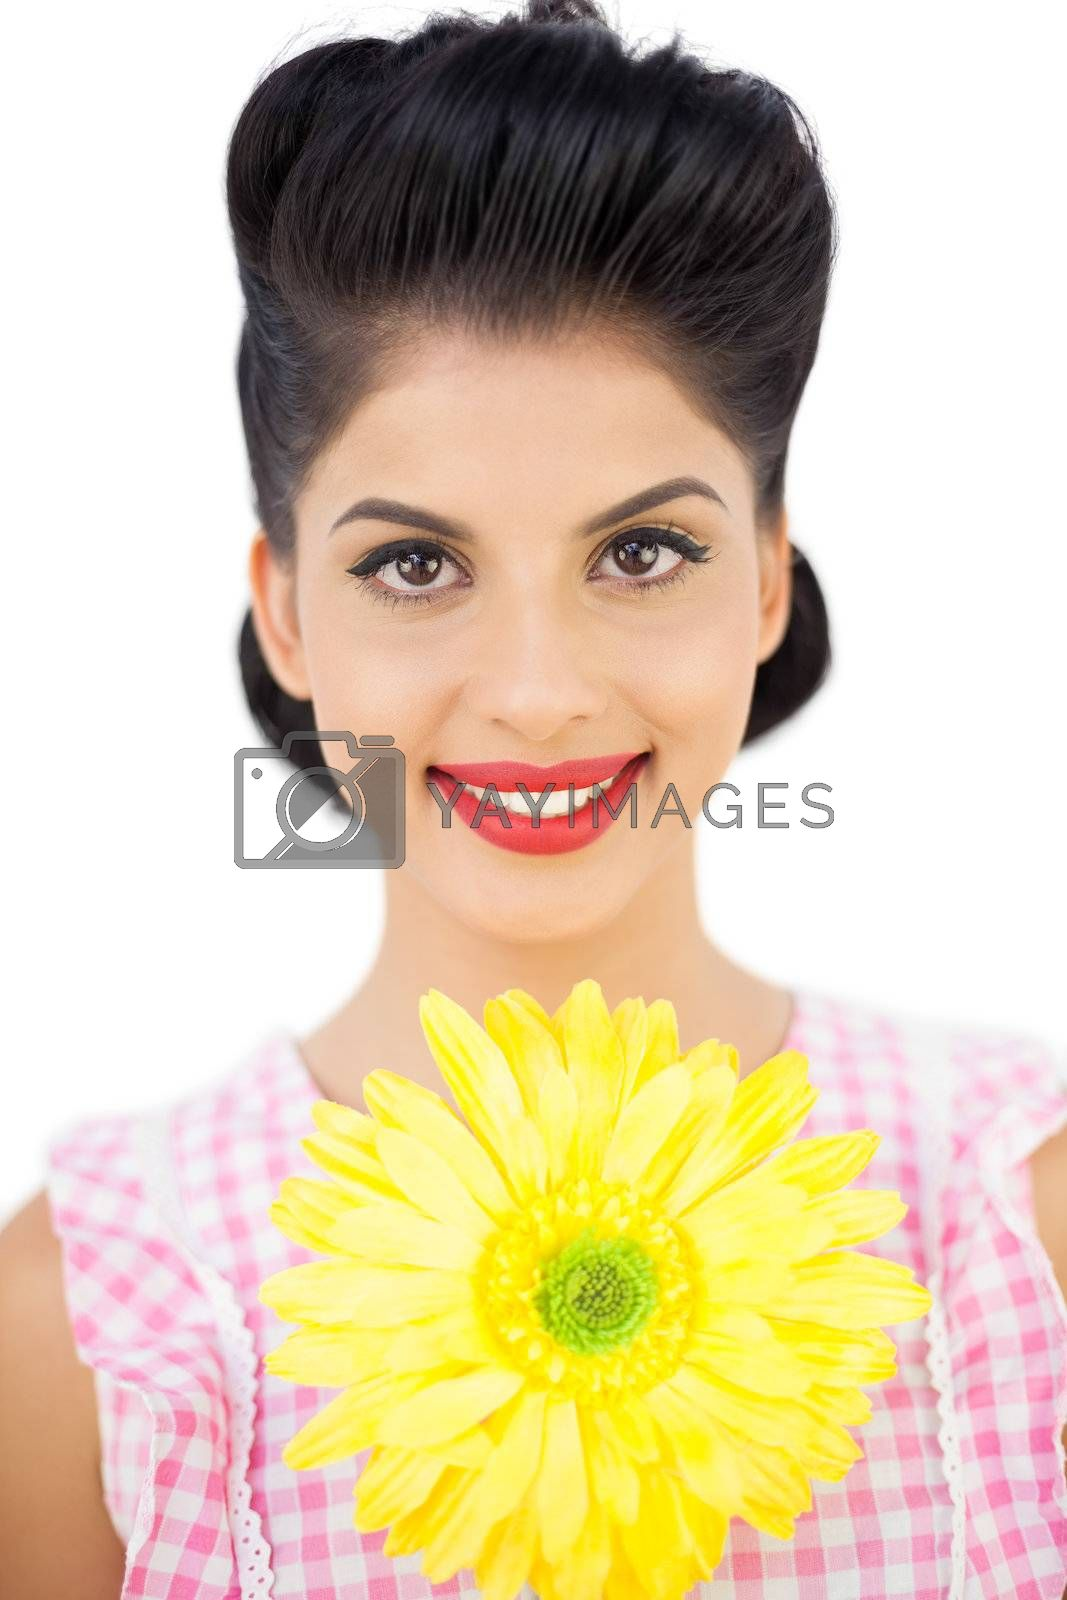 Smiling black hair woman showing a flower by Wavebreakmedia